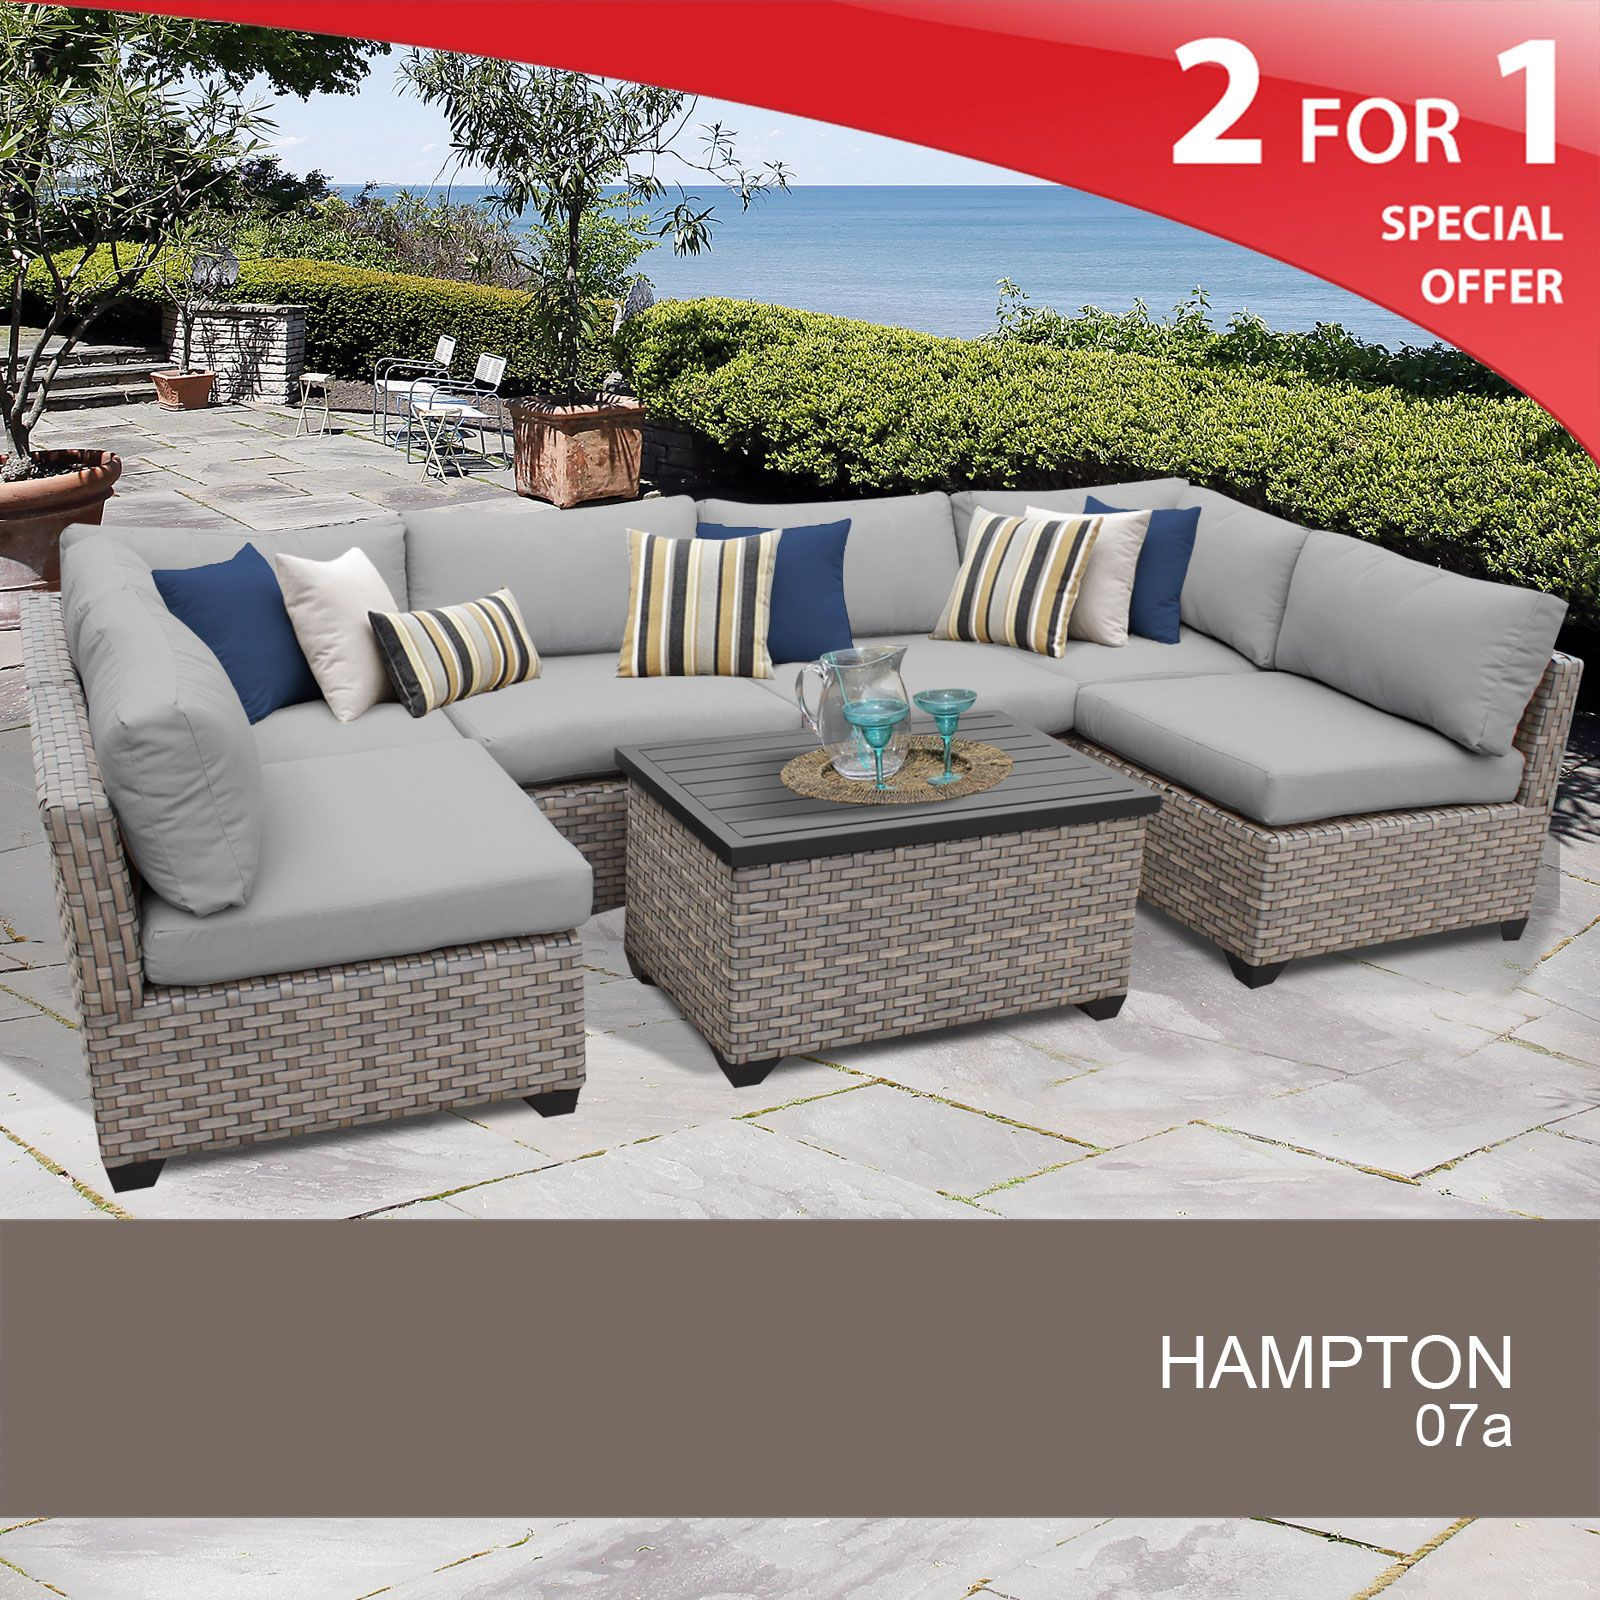 7 piece sofa covers cobalt blue cover hampton outdoor wicker patio furniture set 07a